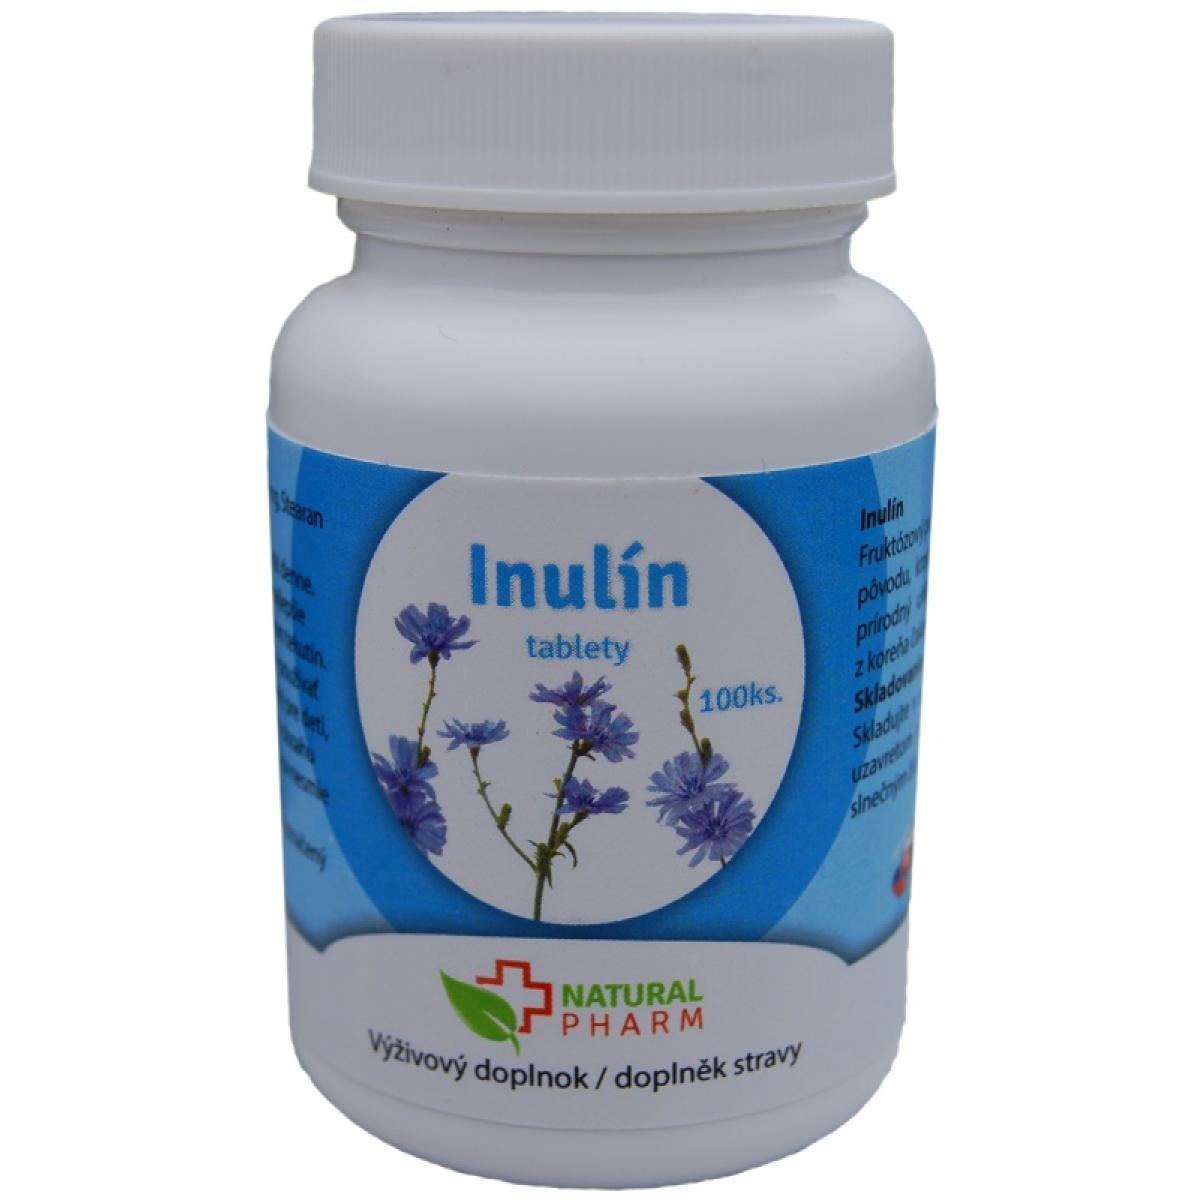 Inulín tablety - 100 ks